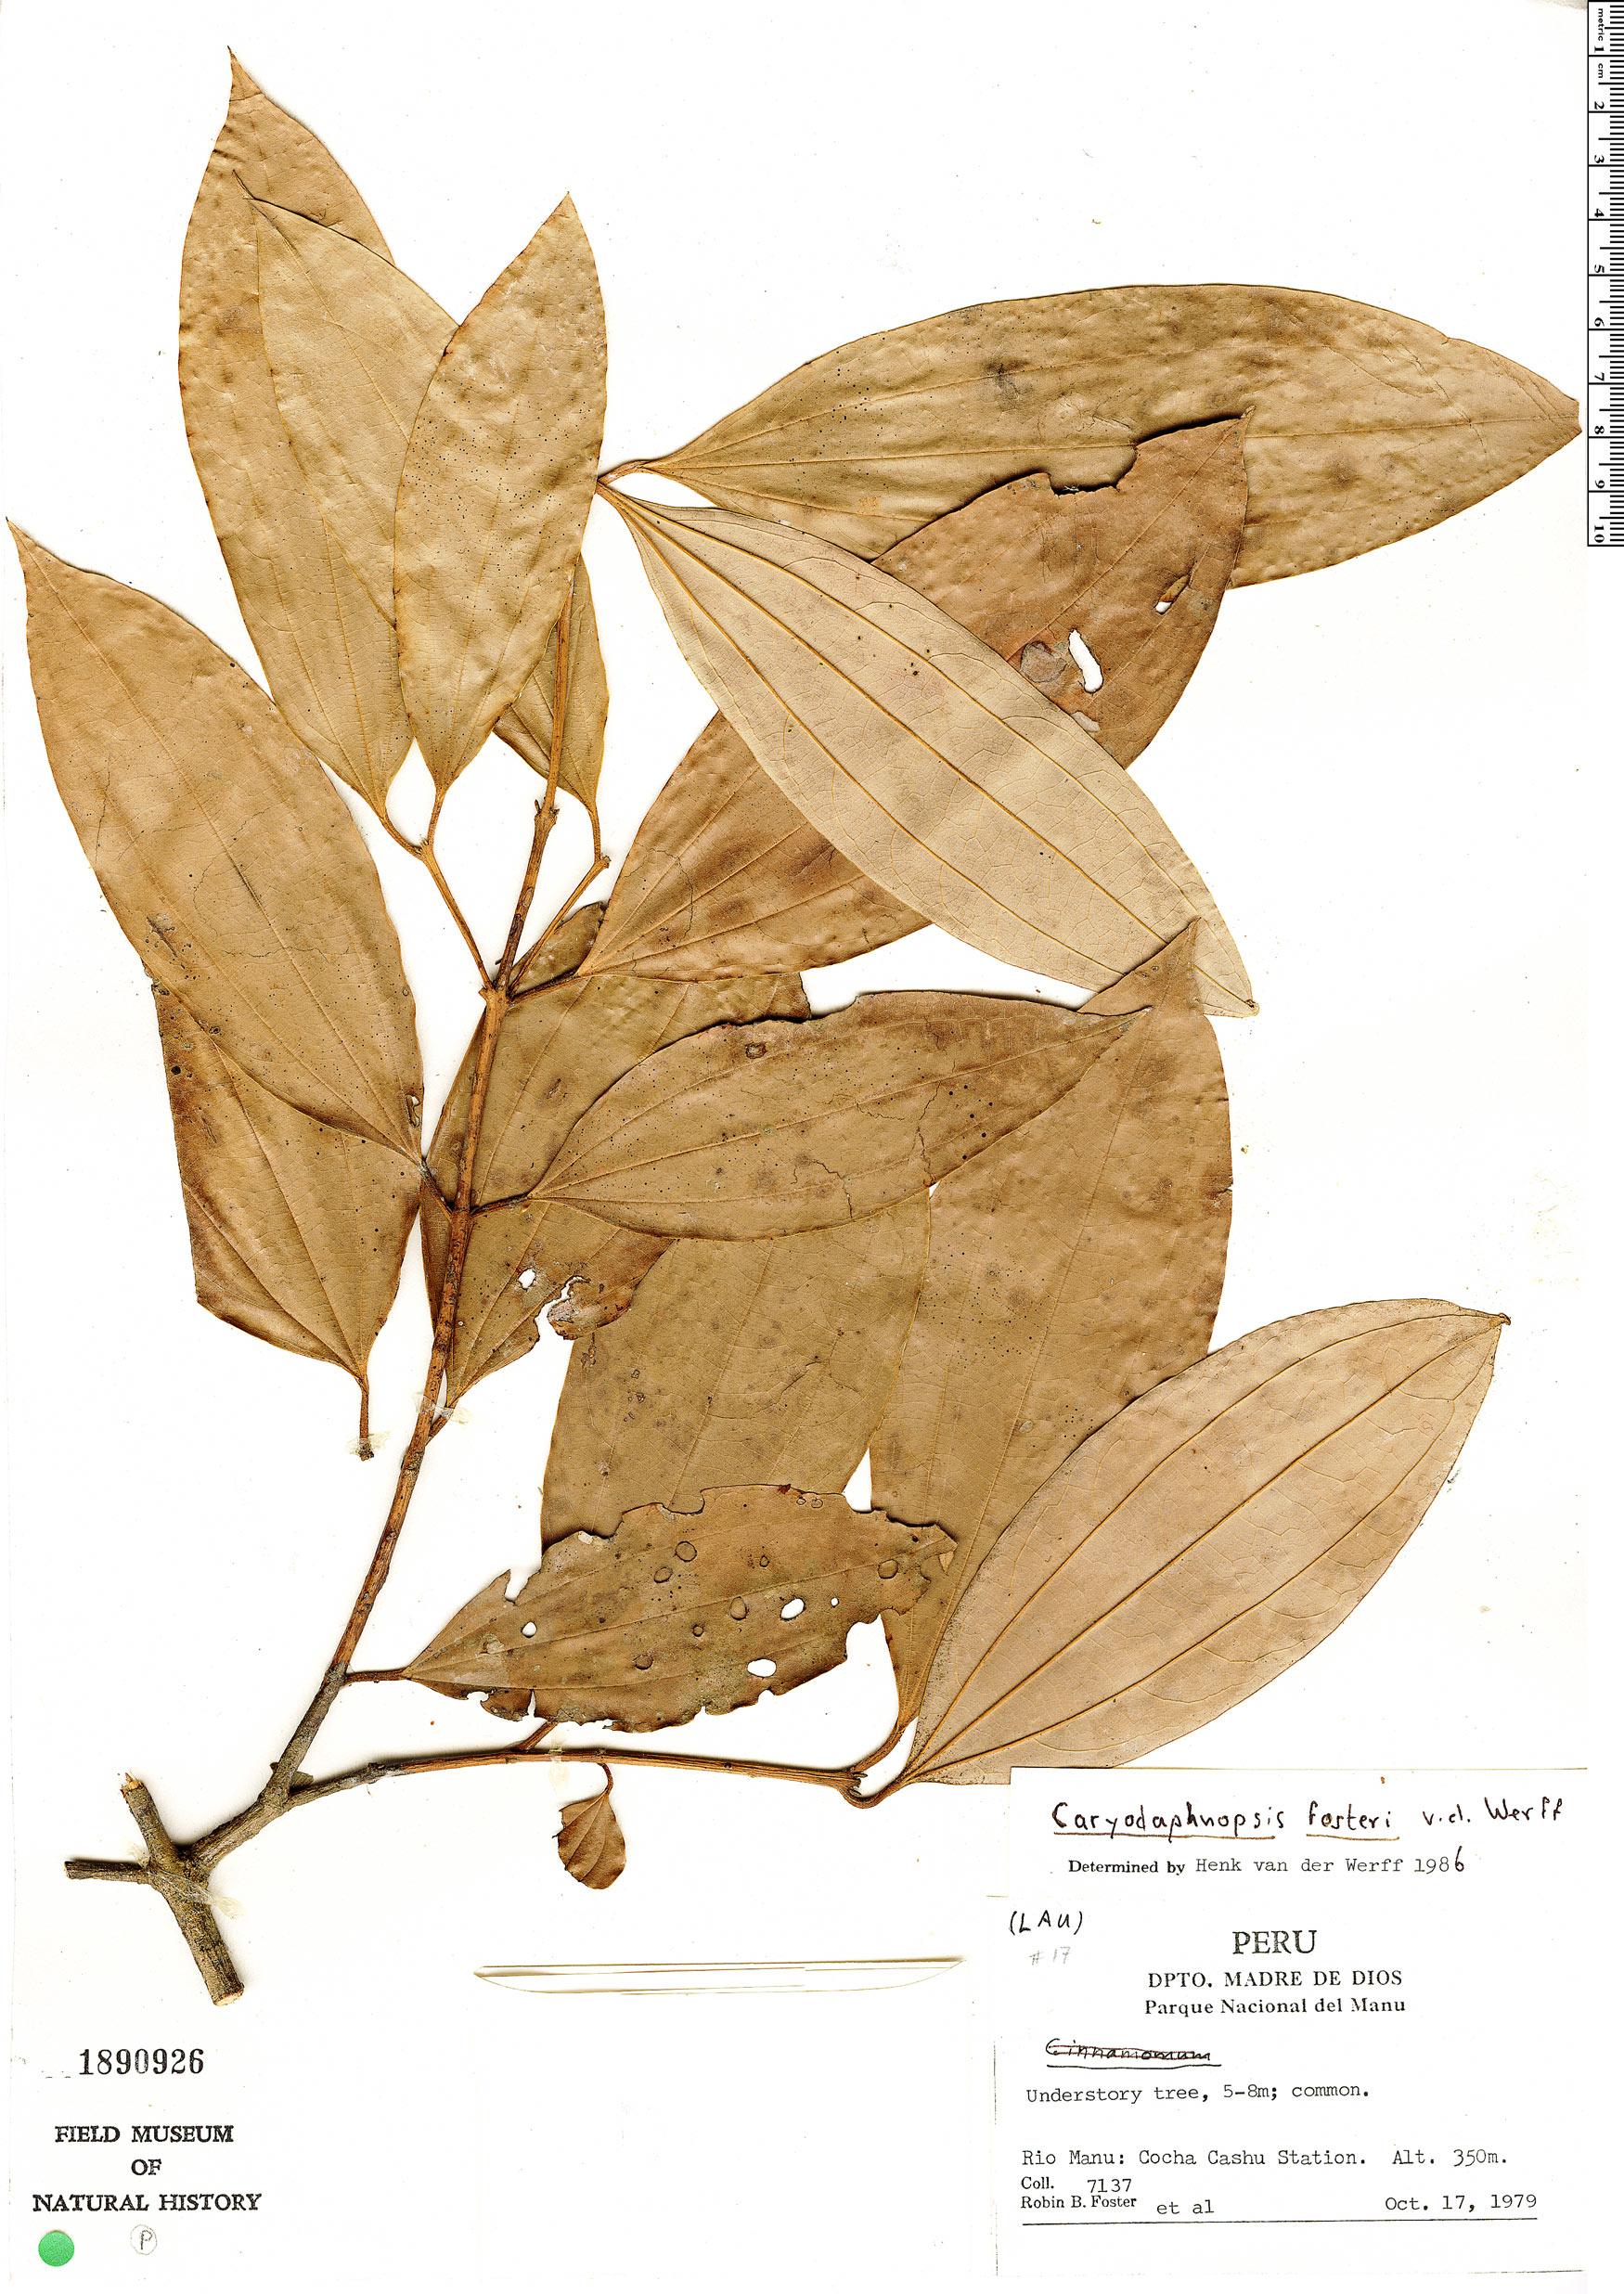 Specimen: Caryodaphnopsis fosteri